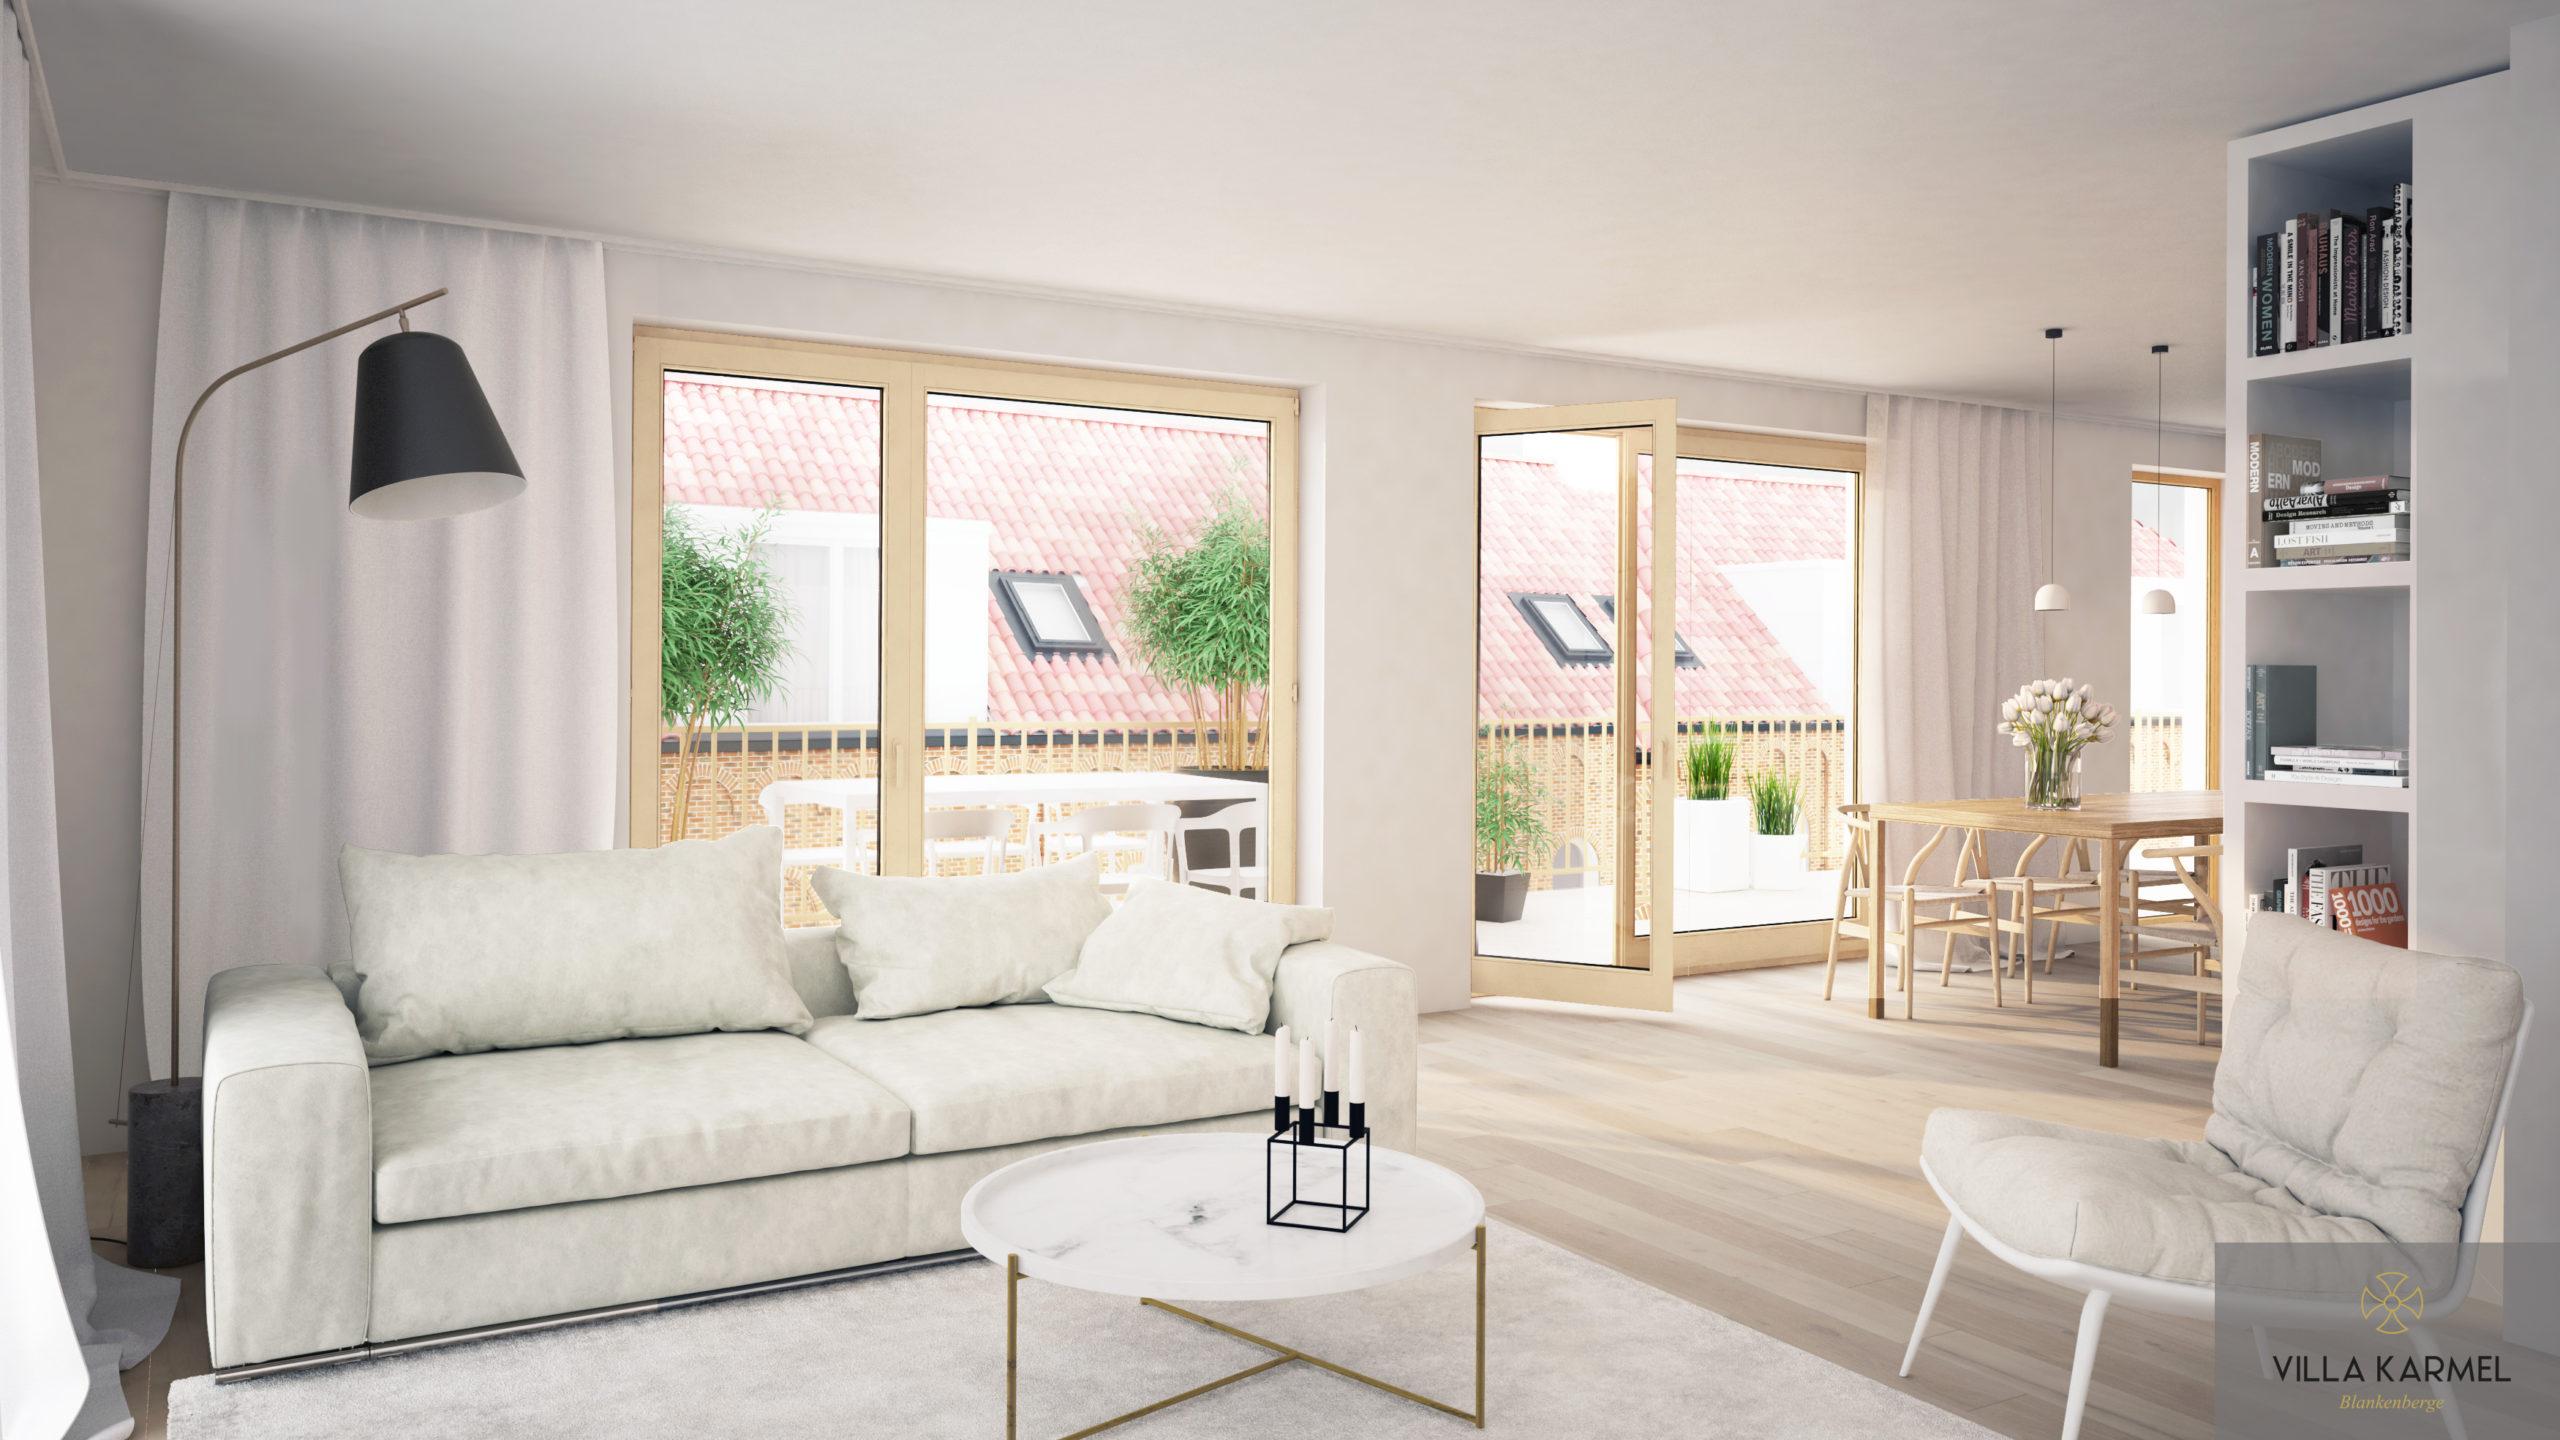 Afbeelding nieuwbouwproject Villa Karmel